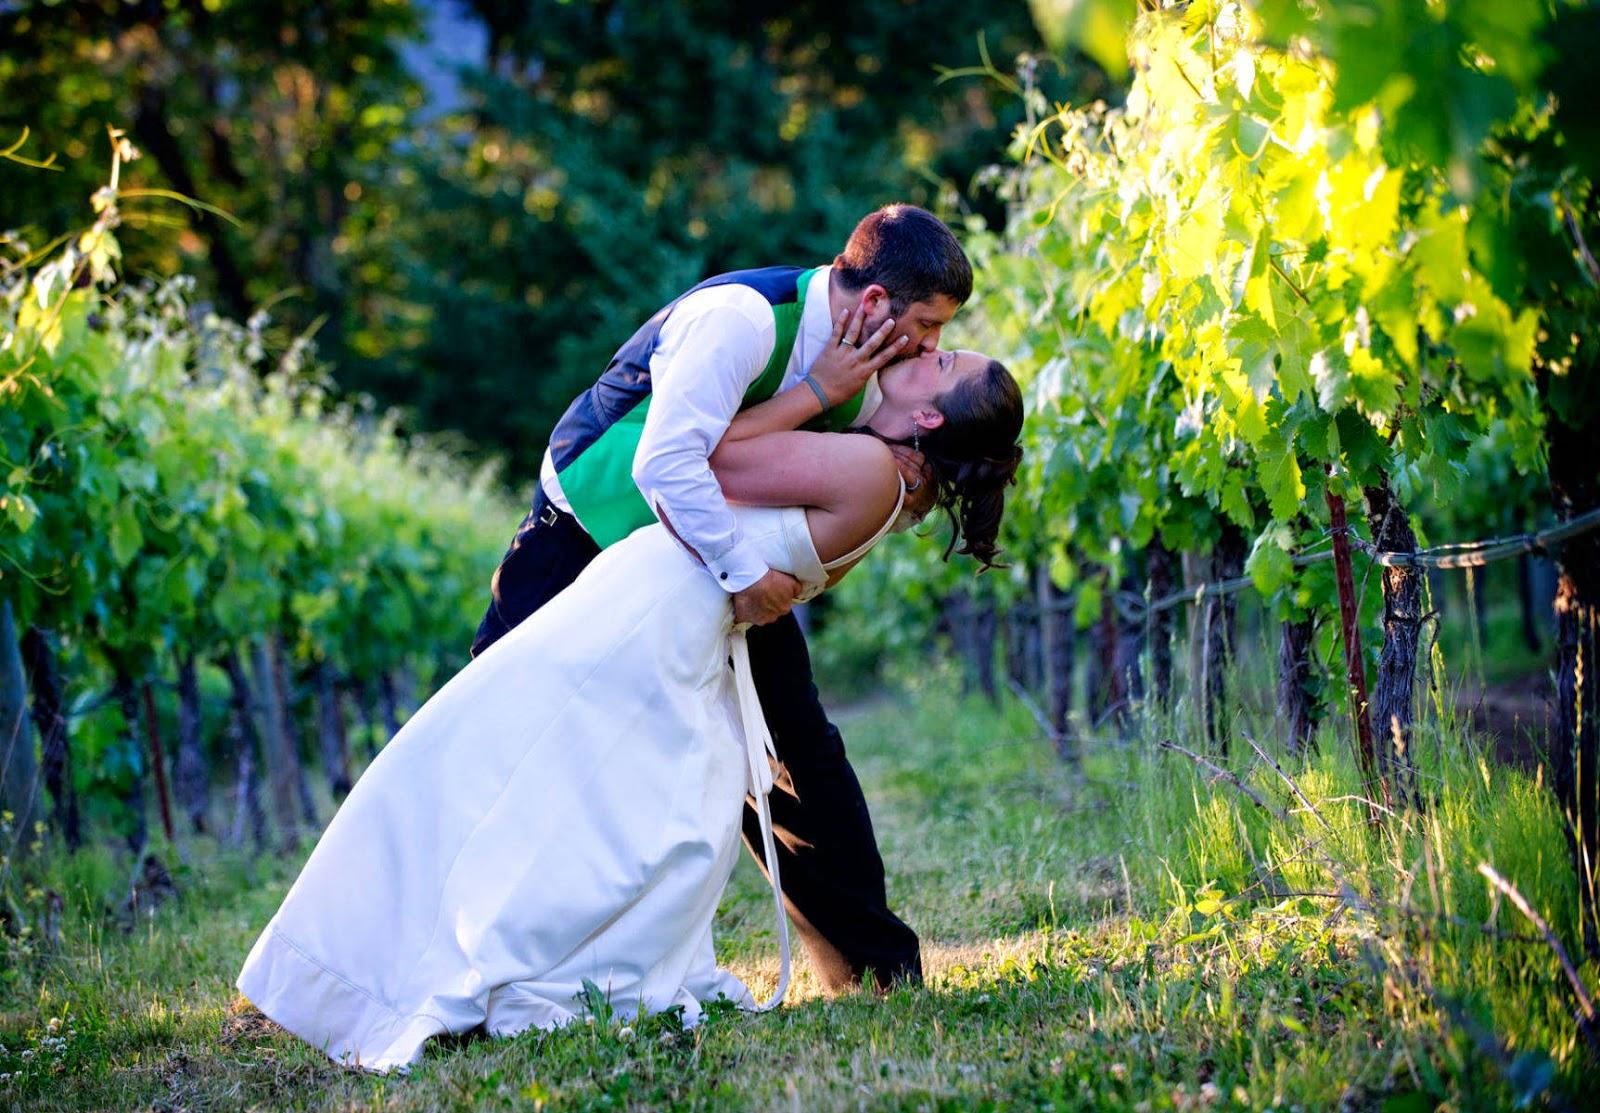 Romantic kiss - Romantic wedding wallpaper